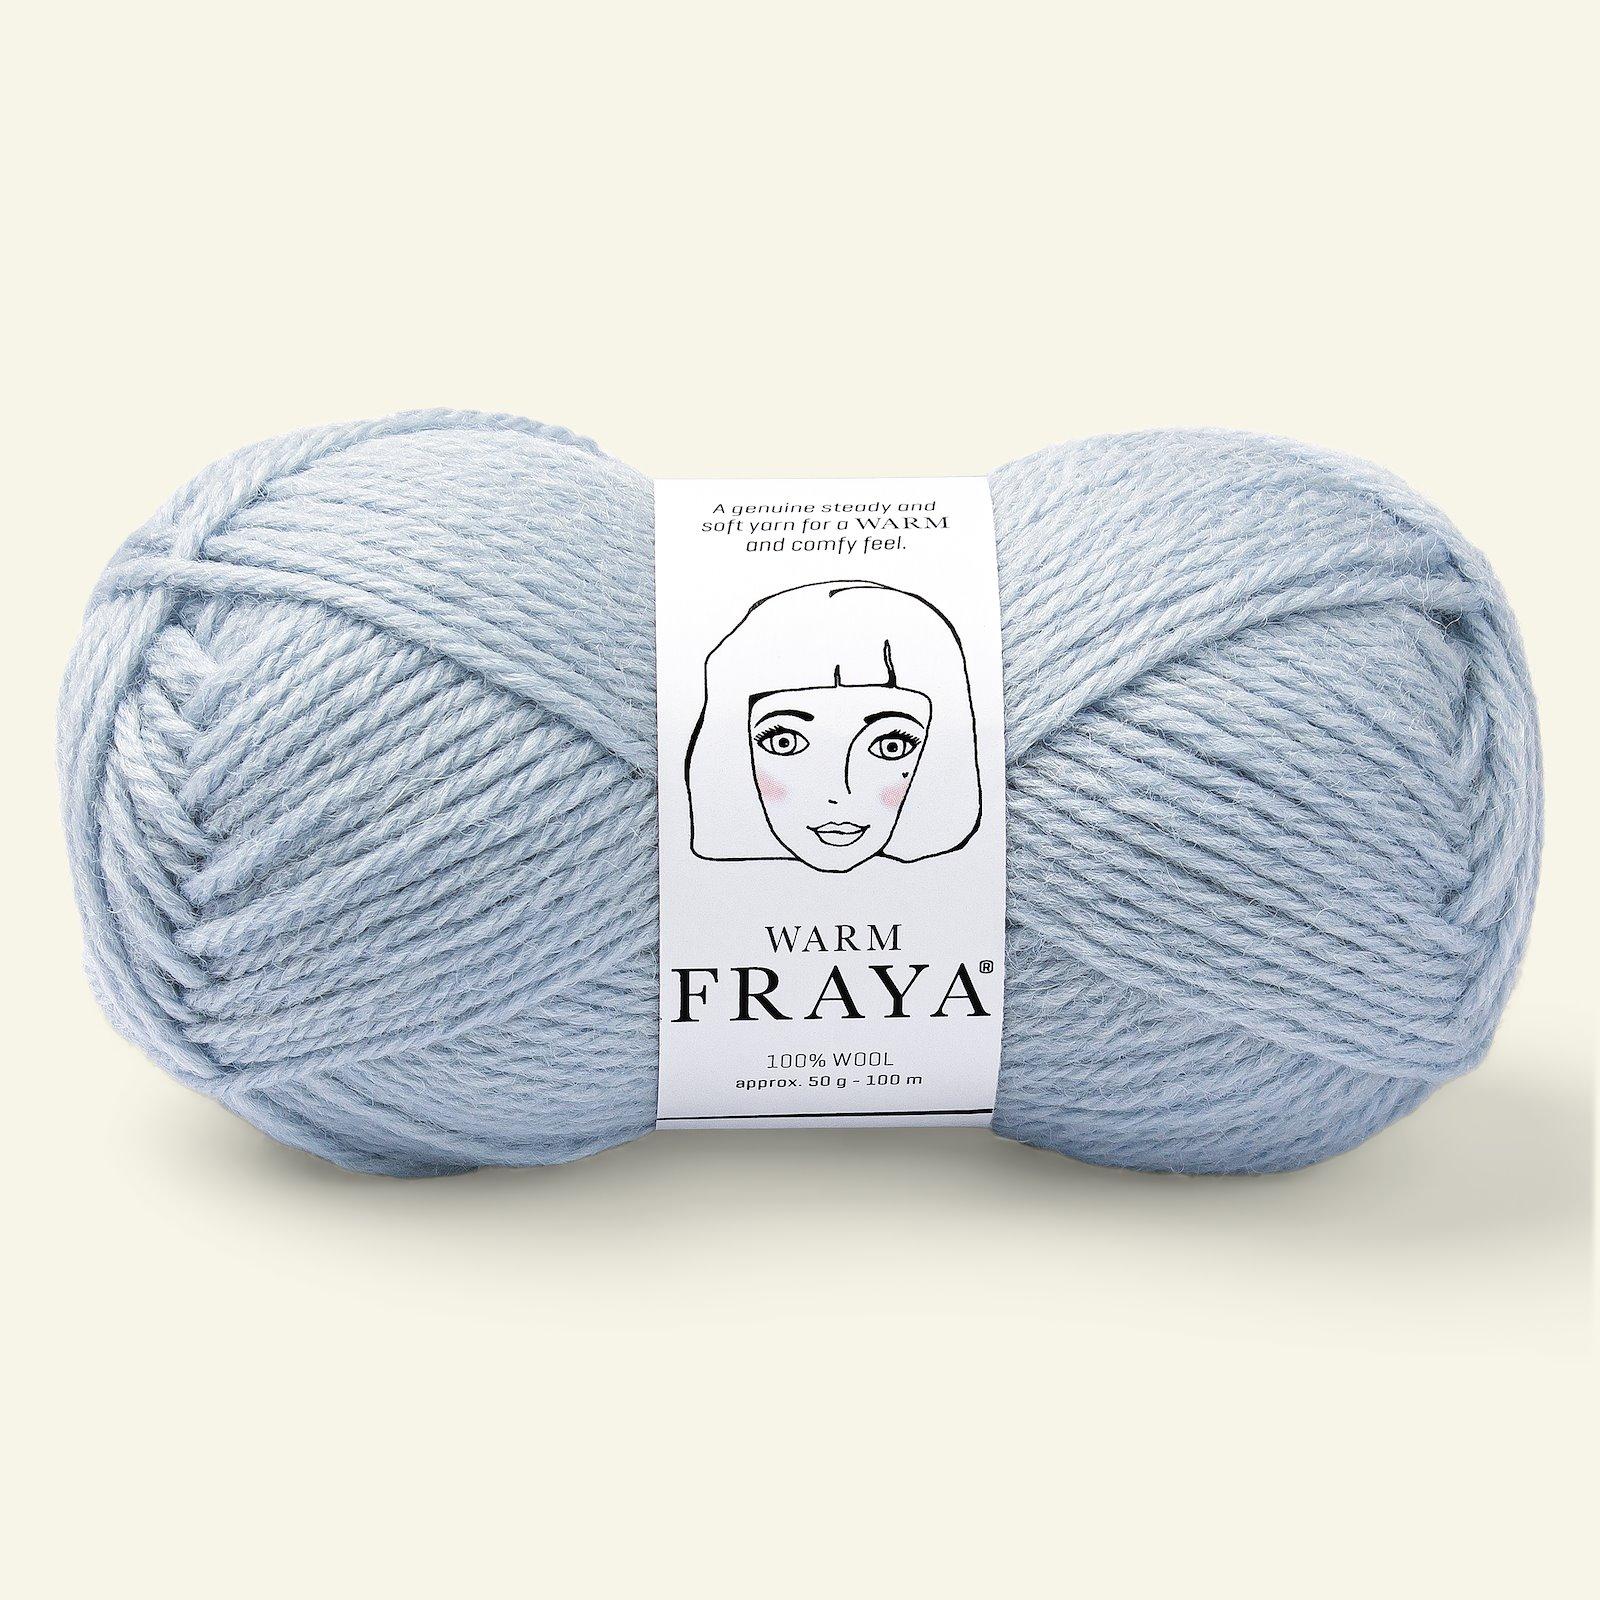 Warm 50g, pale blue 90000129_pack